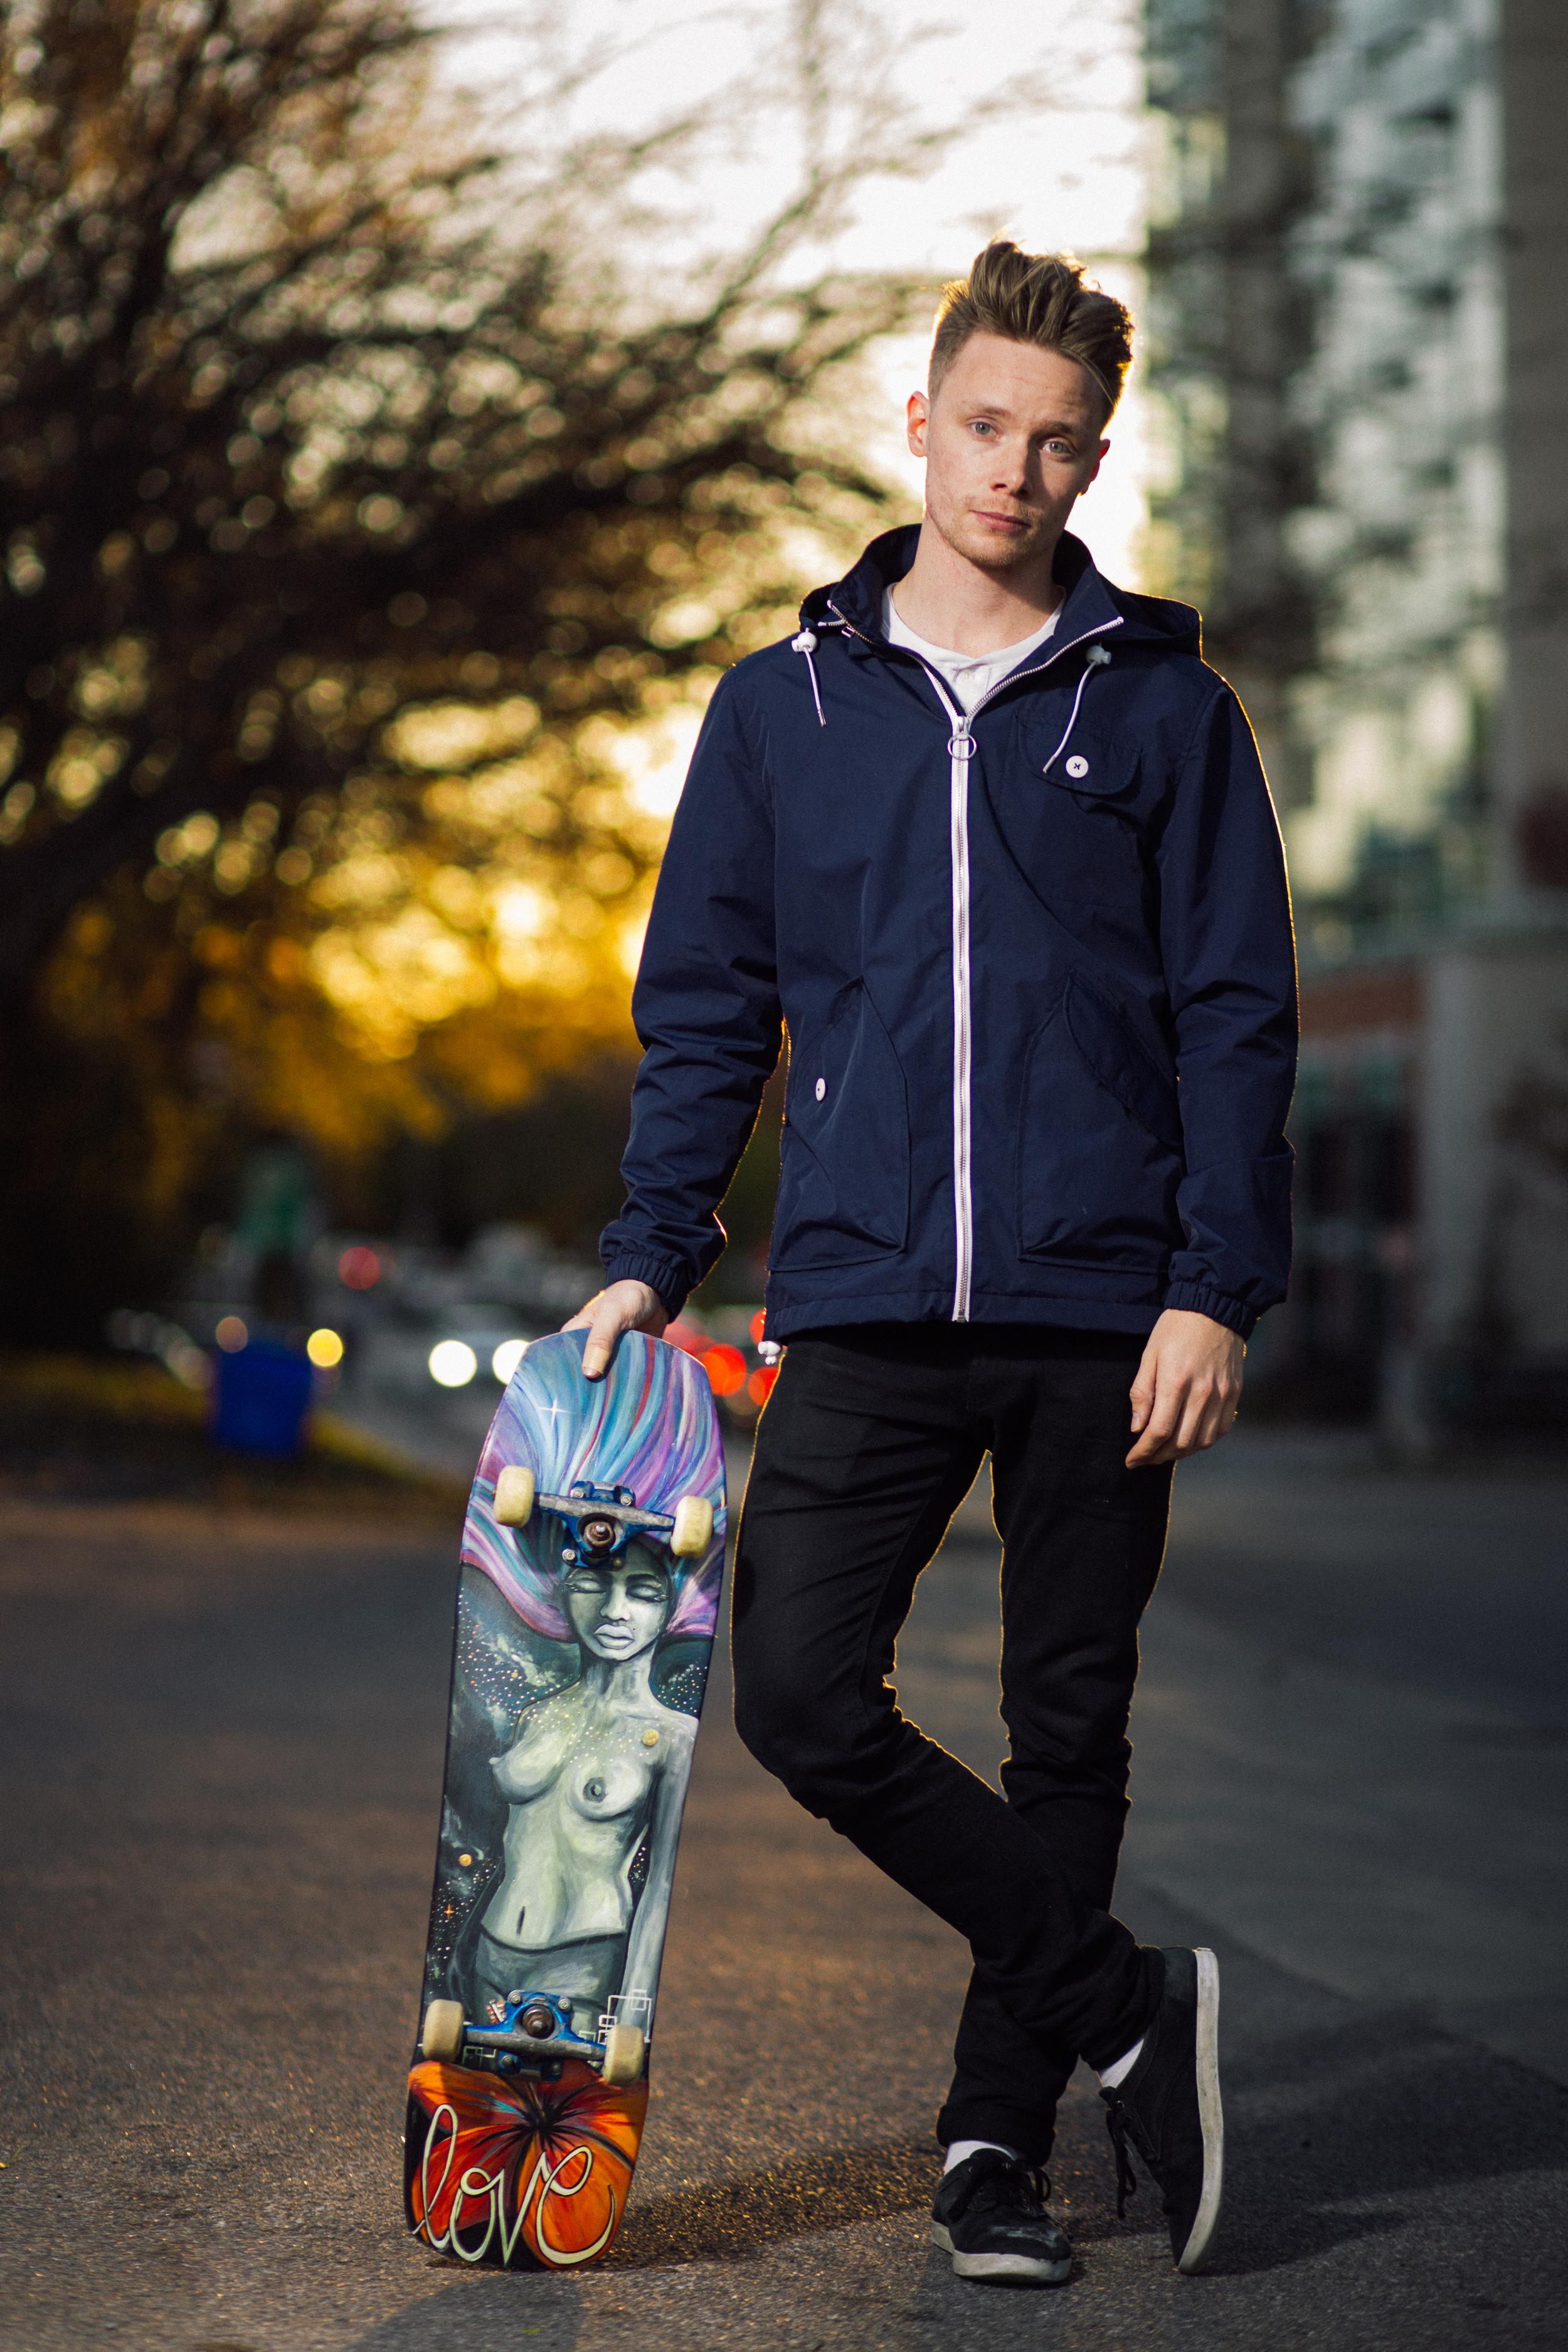 151023-174245-SkylerSkateboarding_DavidJohnsonPhotography_Mailyne Briggs_Dream Love Grow Art-0005.jpg